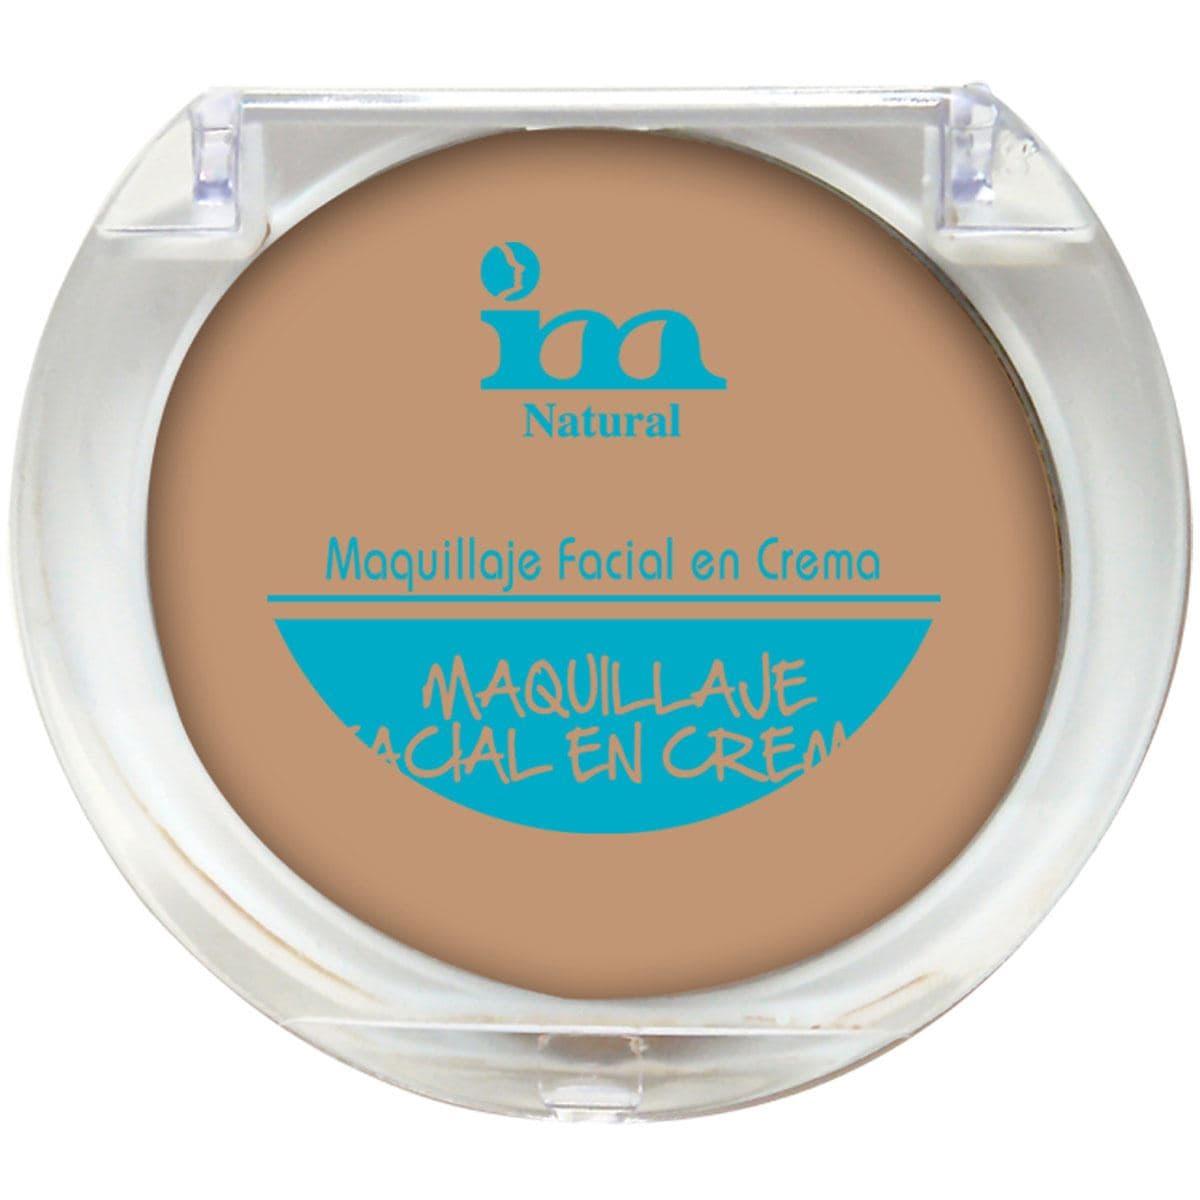 Maquillaje Facial En Crema Natural 2 Blíster IM